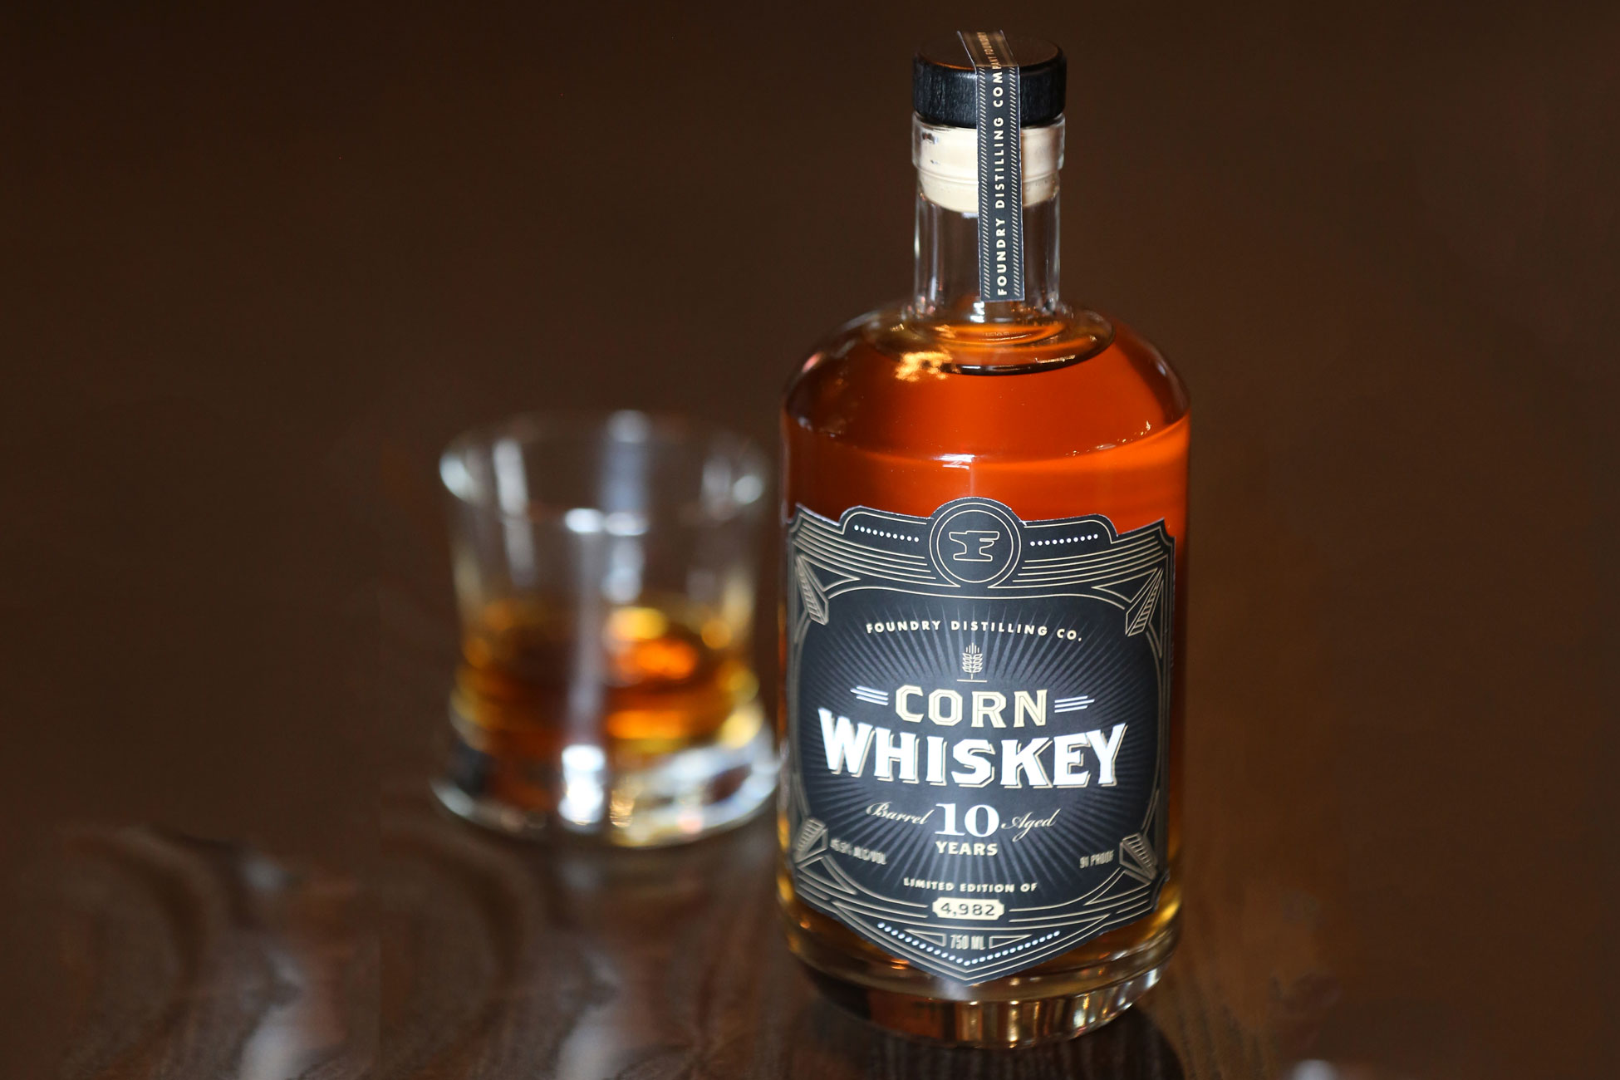 Foundry Distillery 10 year whiskey